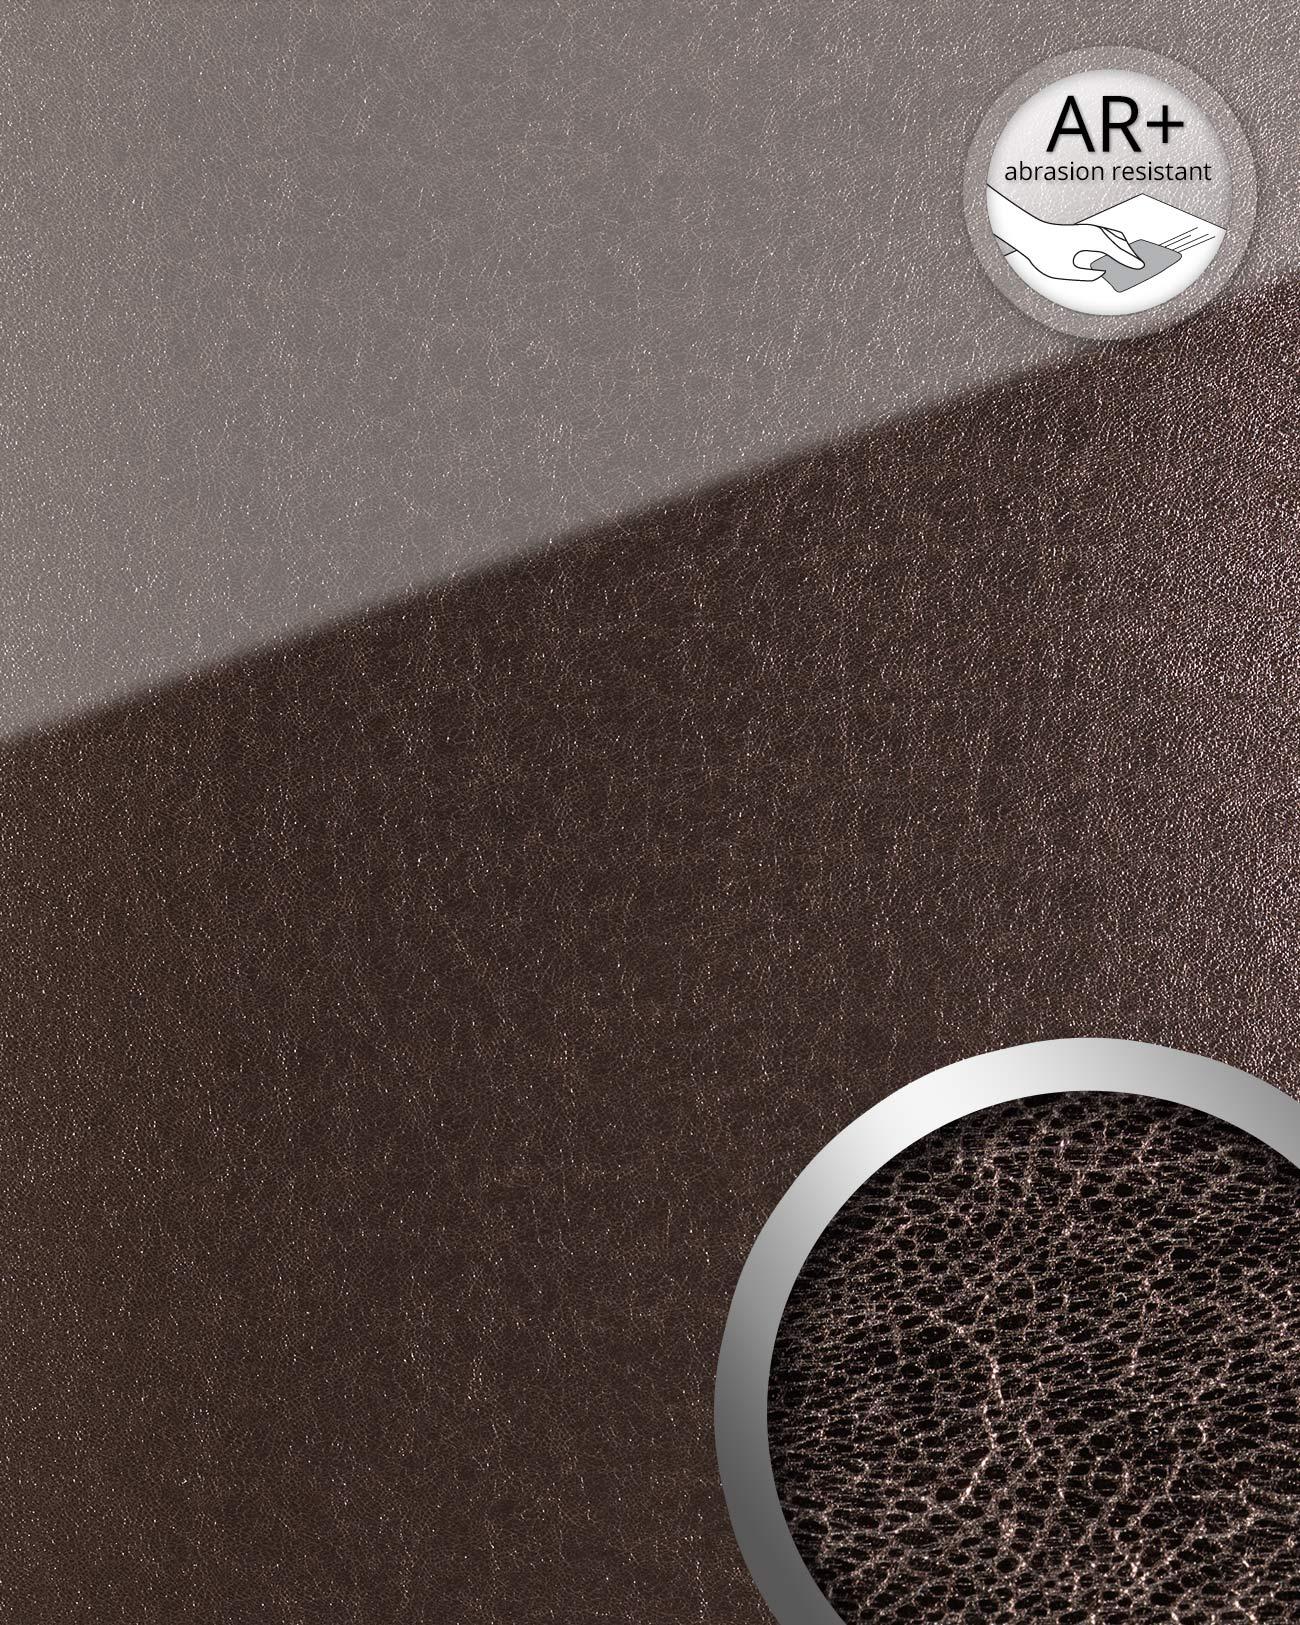 Wandpaneel GlasOptik WallFace SHATTERED Brown AR - Fliesen glasoptik